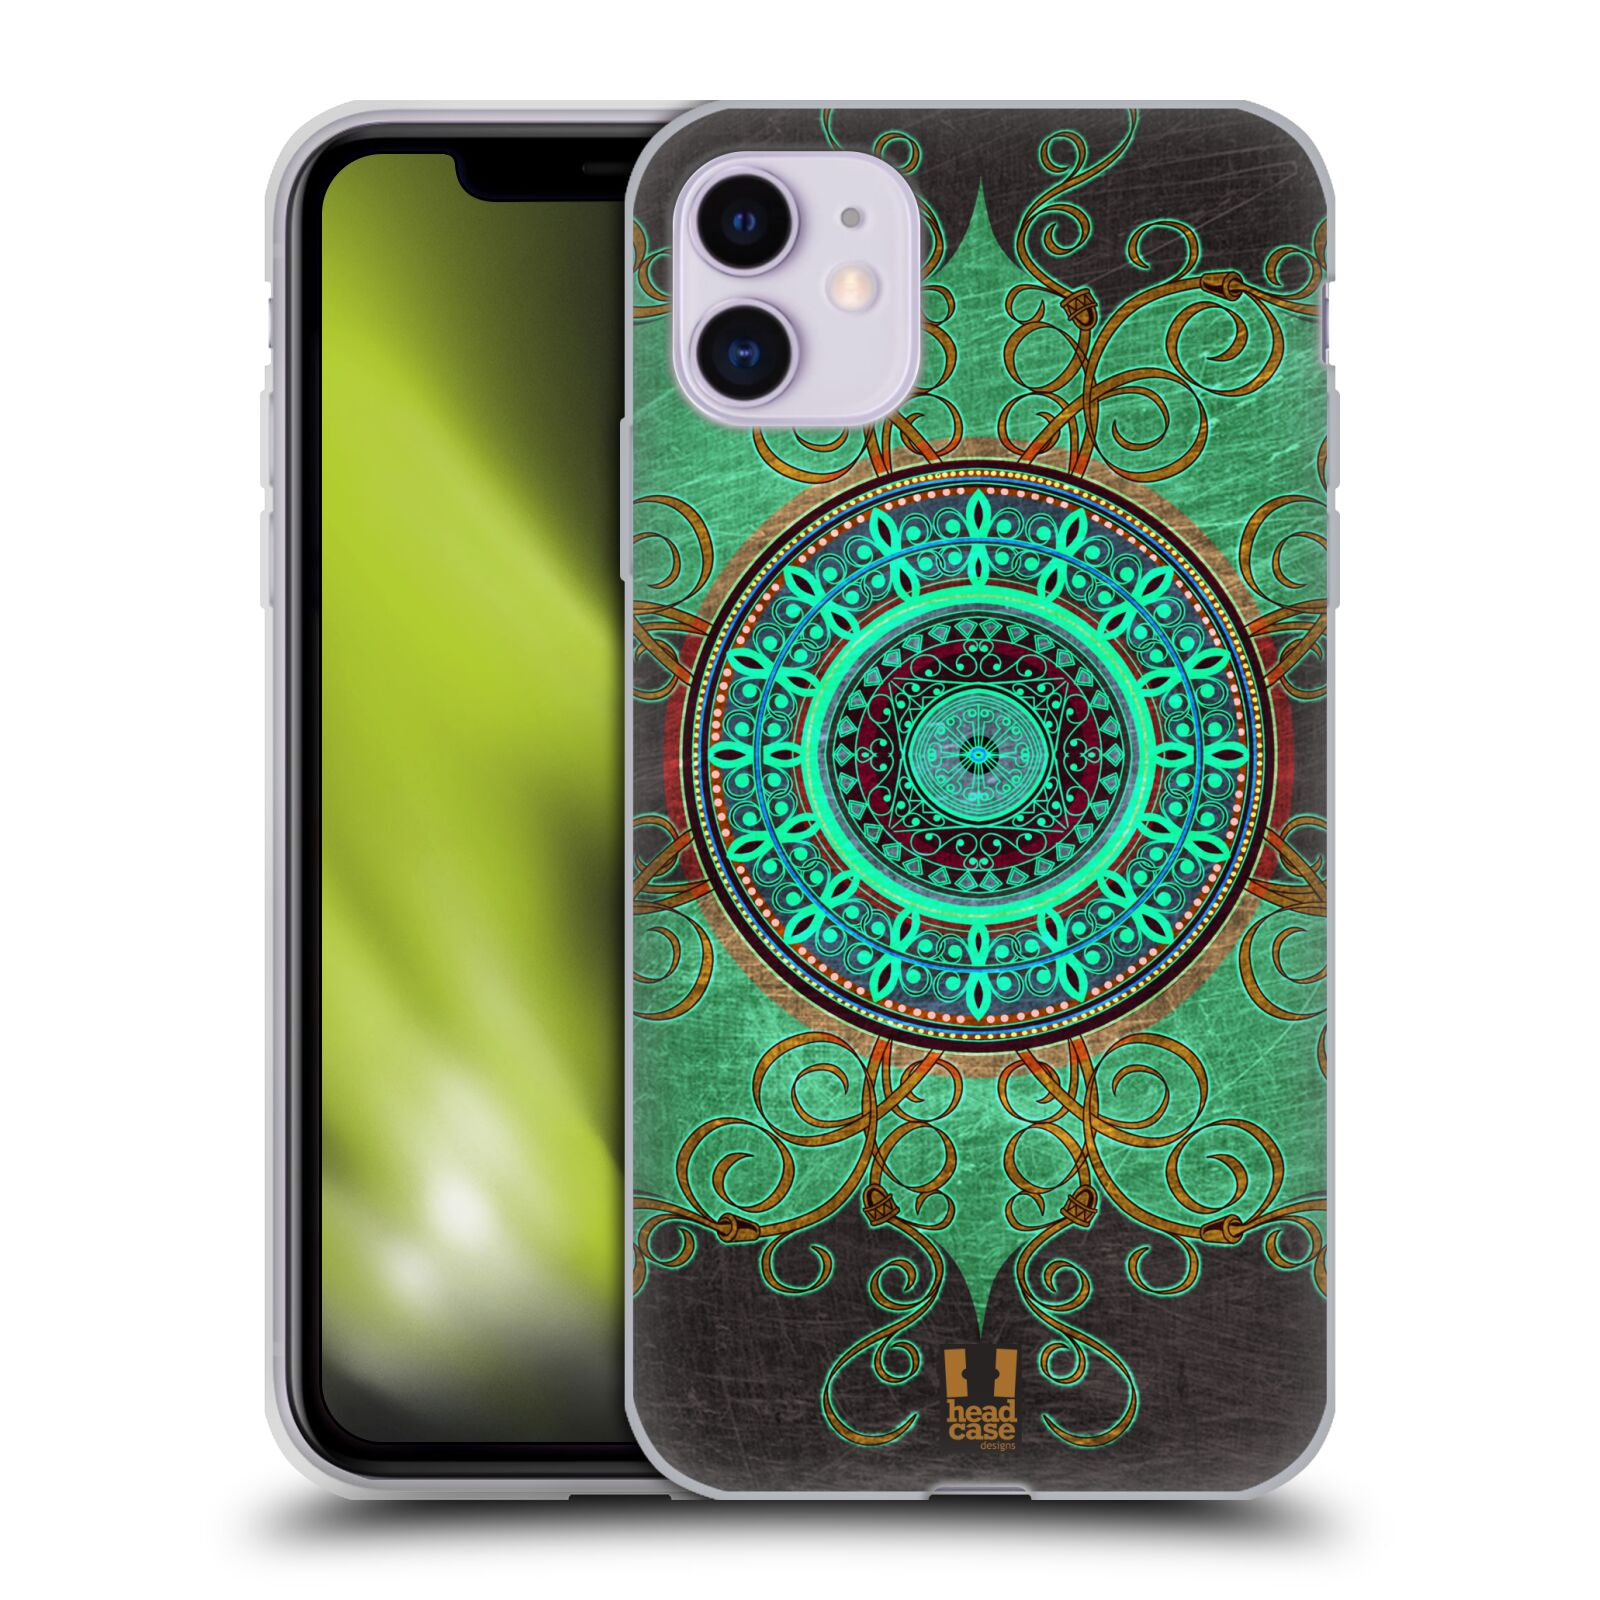 Silikonové pouzdro na mobil Apple iPhone 11 - Head Case - ARAB MANDALA